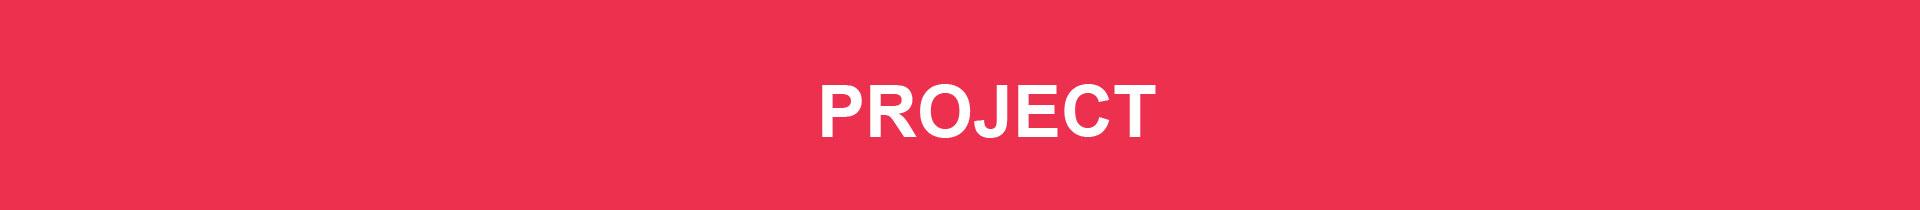 Projet_Section_1920x210_EN